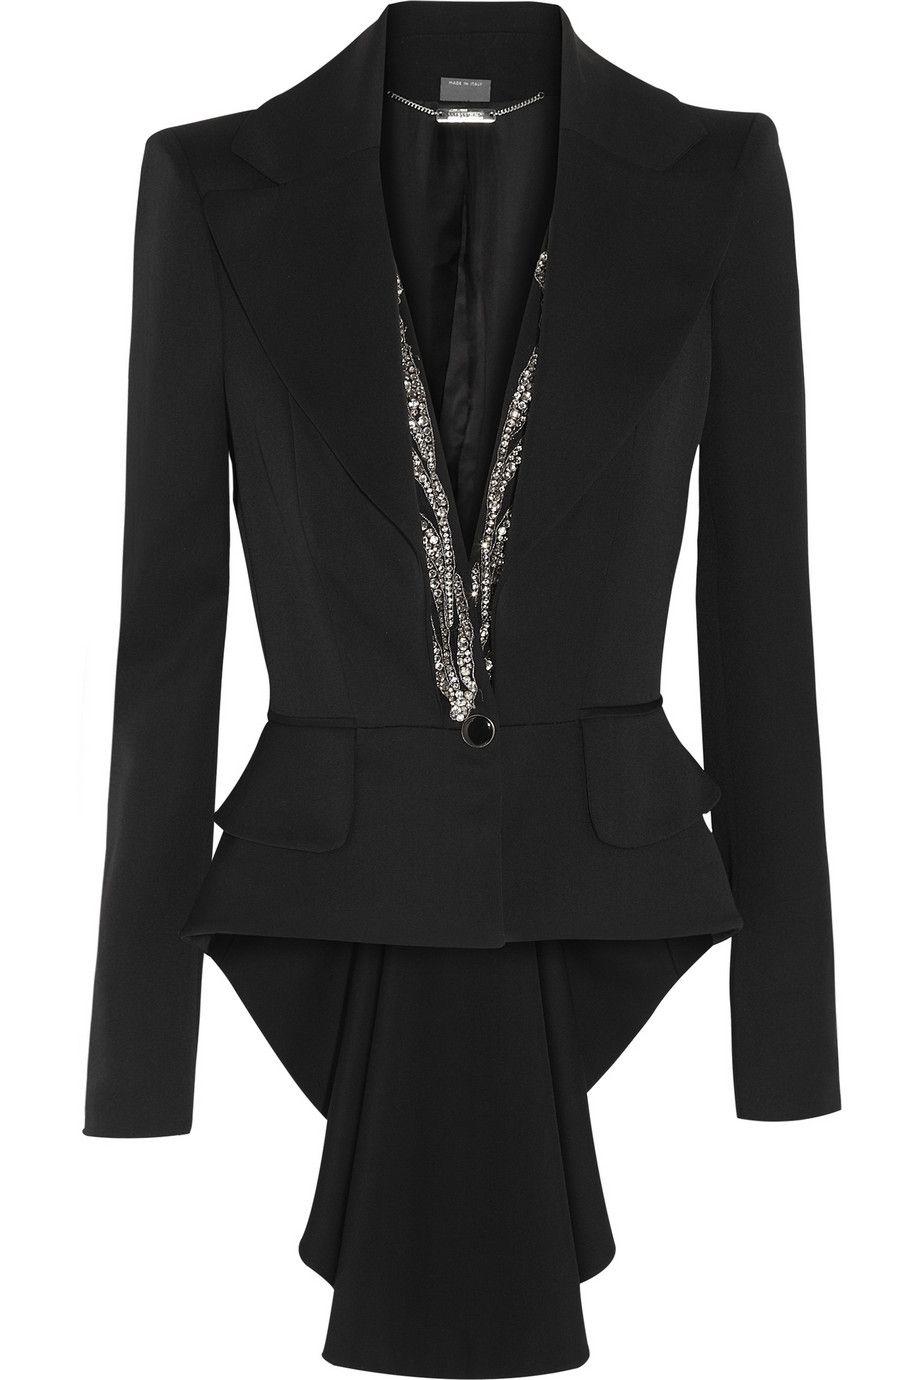 Alexander McQueen   Crystal-embellished wool tailcoat   NET-A-PORTER ... 975de48ab02